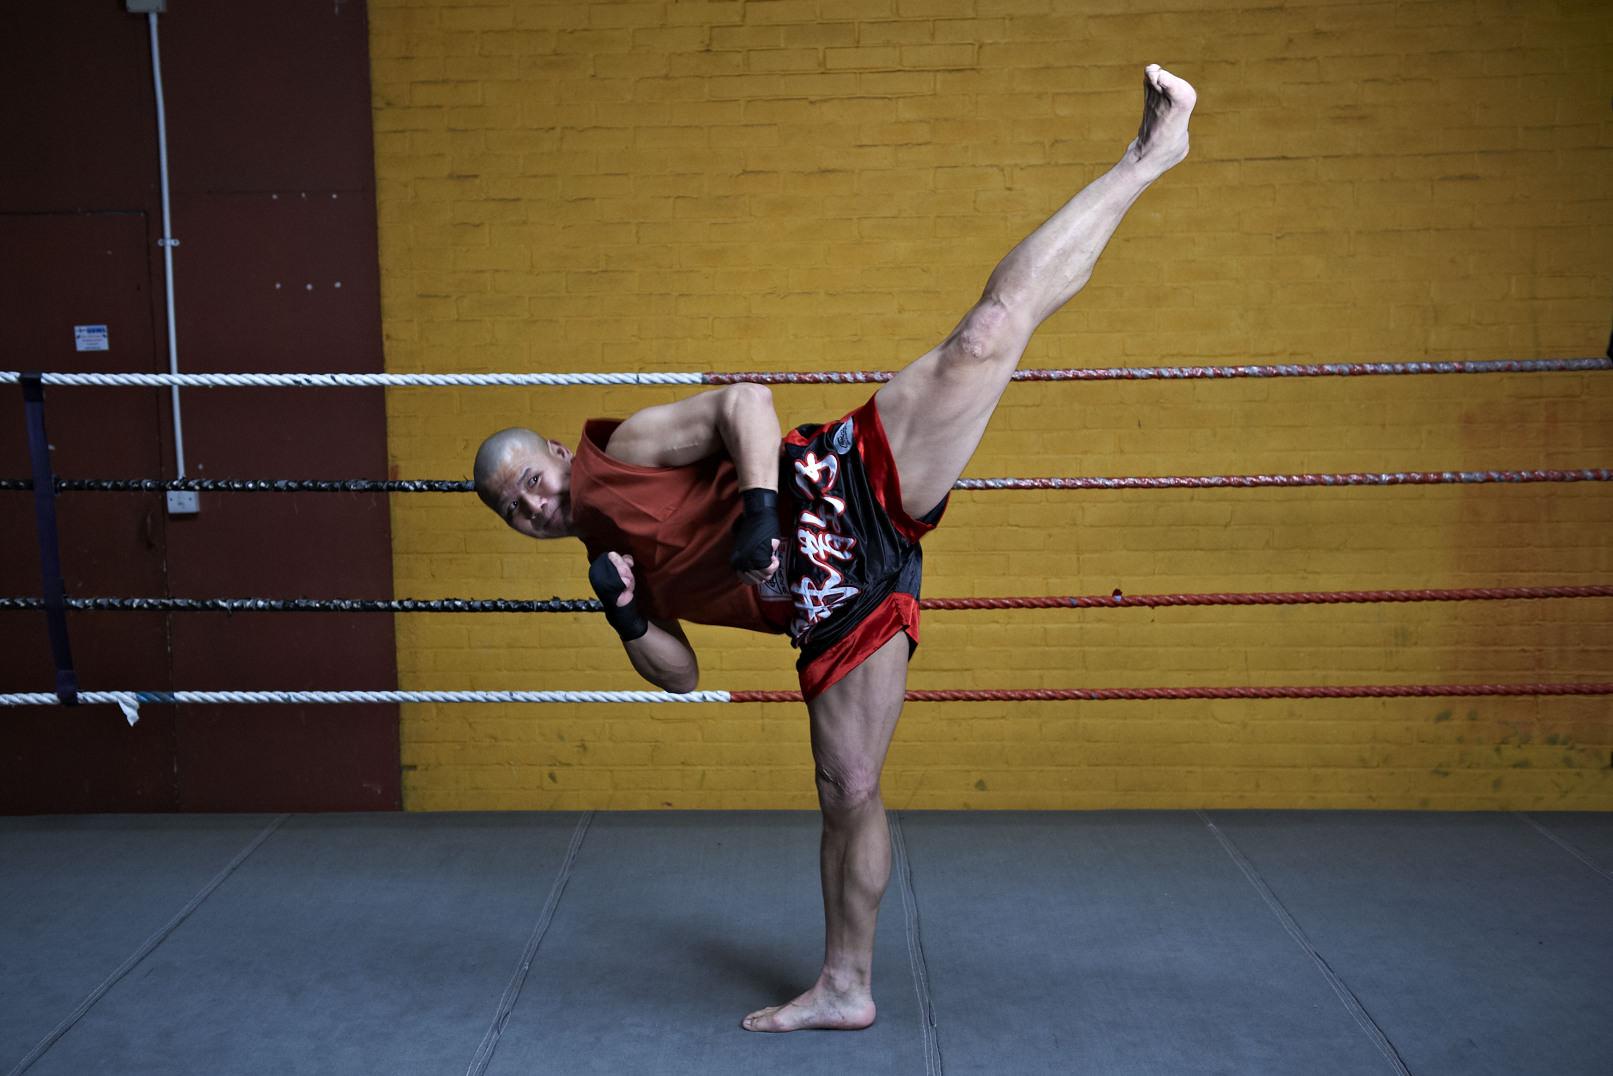 Shaolin temple uk shifu yanzi kick 33.jpg